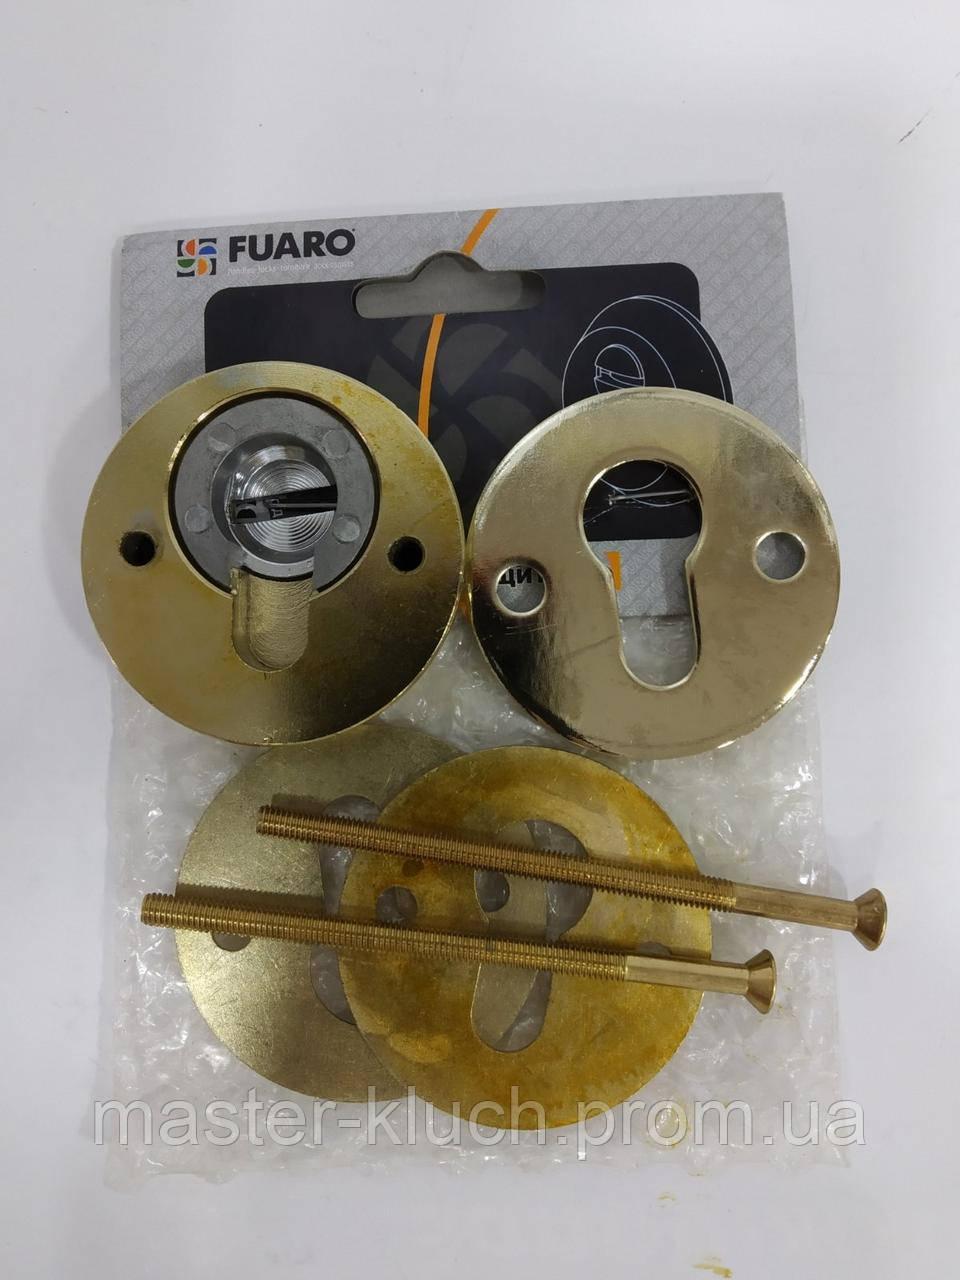 Броненакладка Fuaro DEF 5513 золото